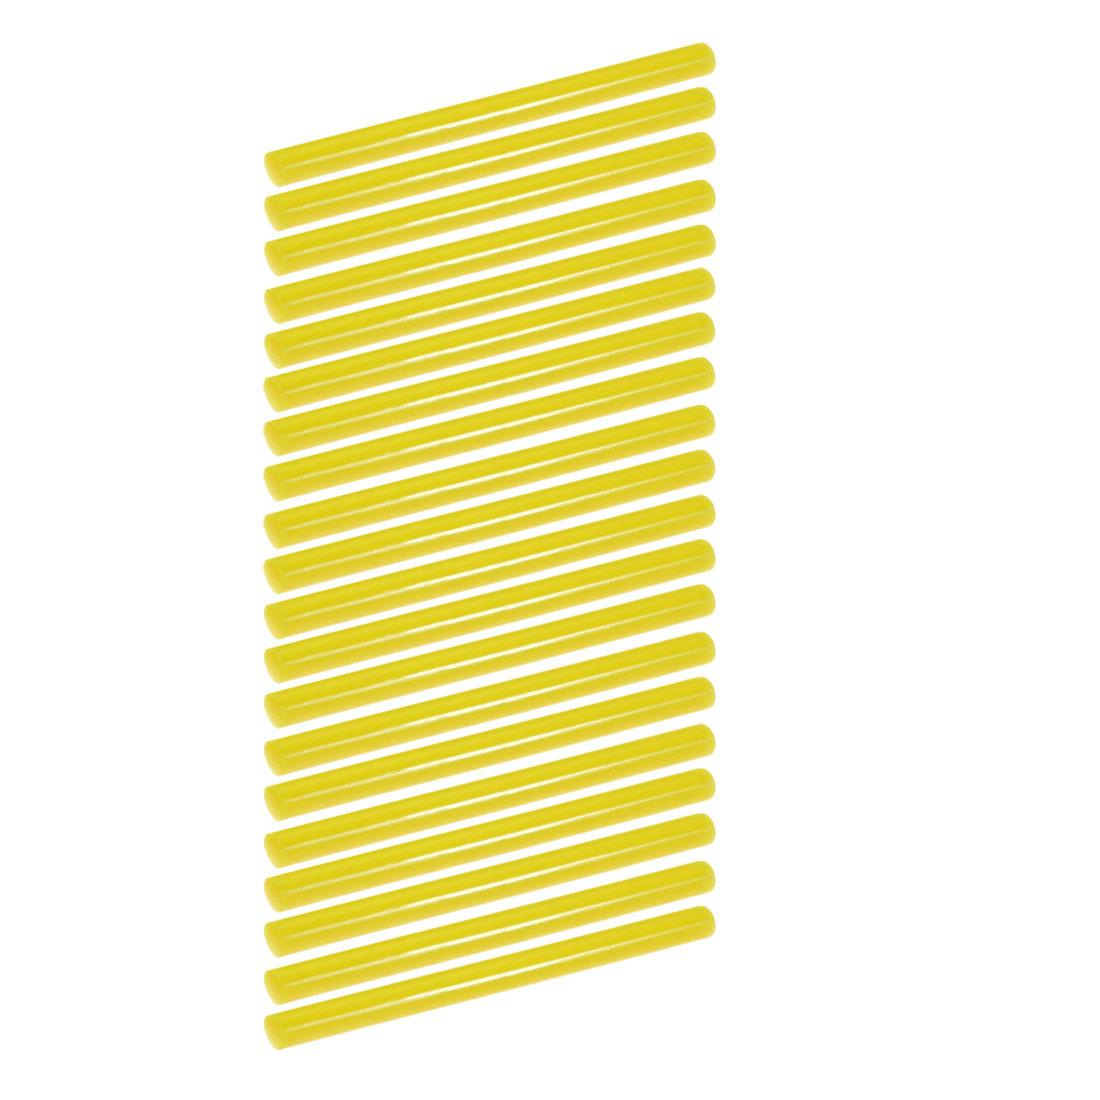 20pcs 7mm Dia 100mm Long Hot Melt Glue Adhesive Stick Yellow